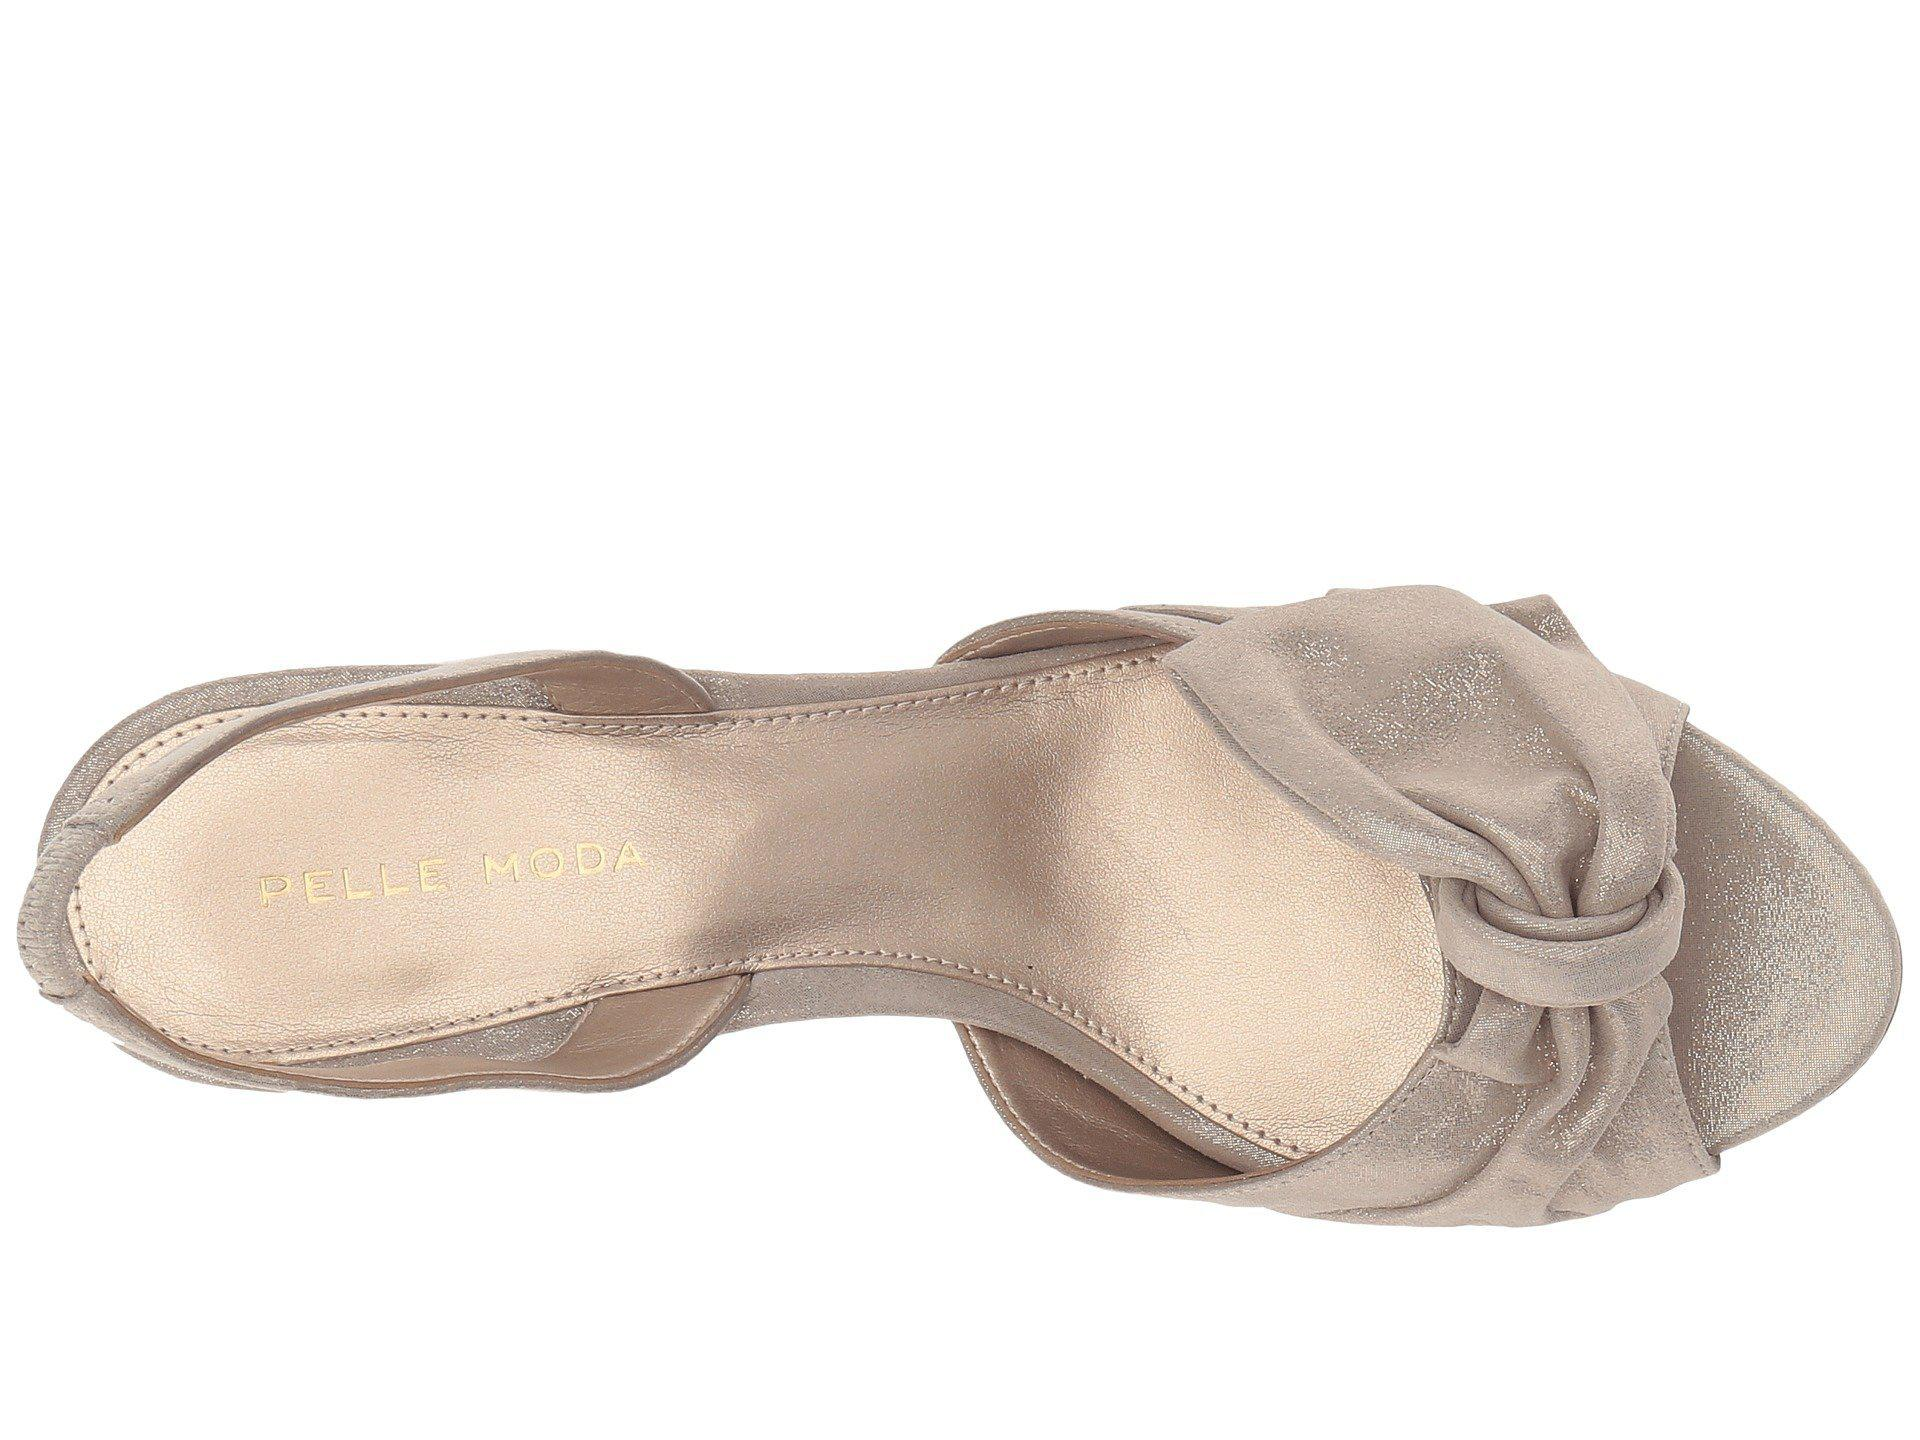 769c37d6f51e Pelle Moda - Multicolor Lovi (black Suede) Women s Shoes - Lyst. View  fullscreen